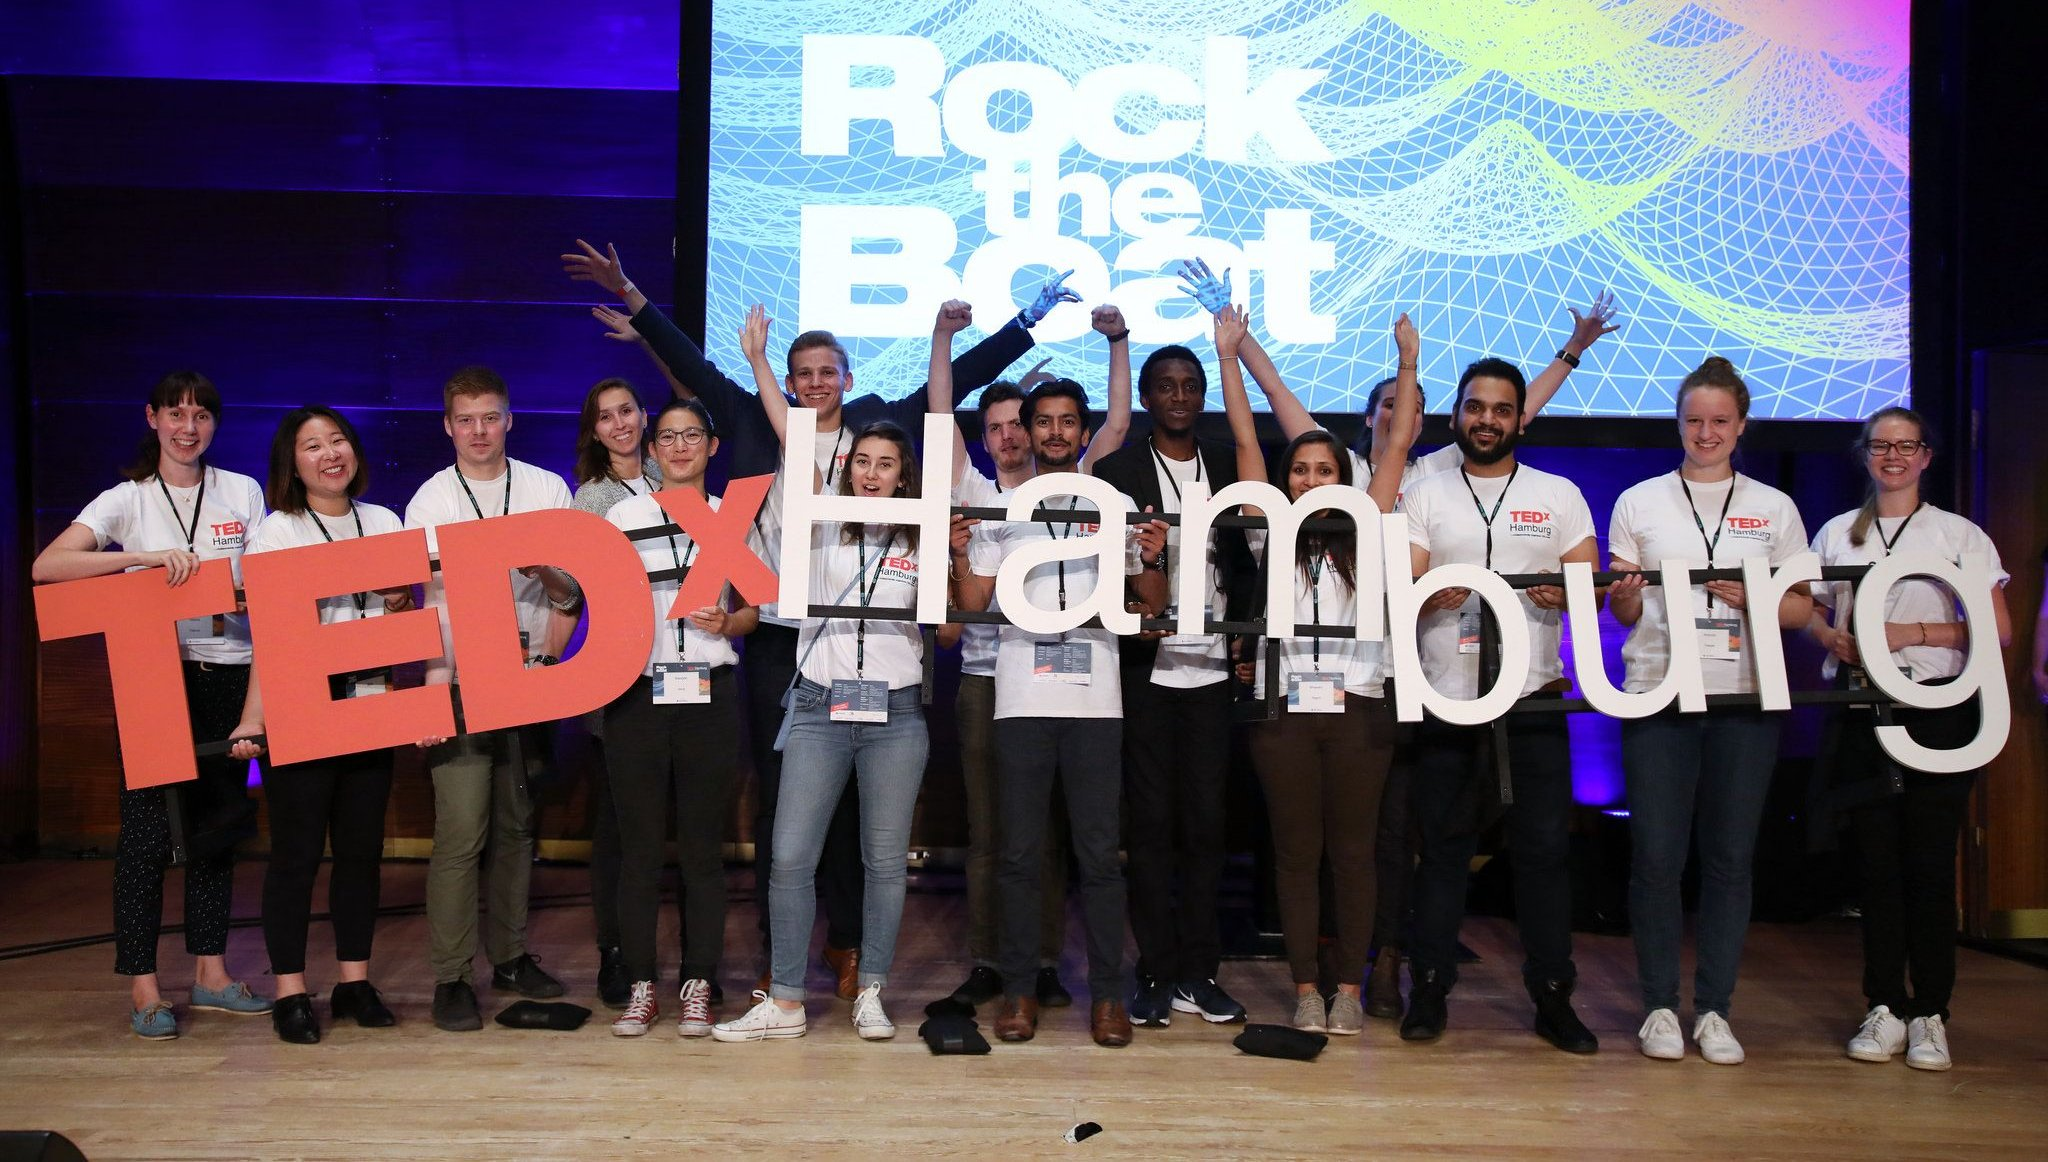 TEDxHamburg 2017, Photo: Sebastian Gabsch